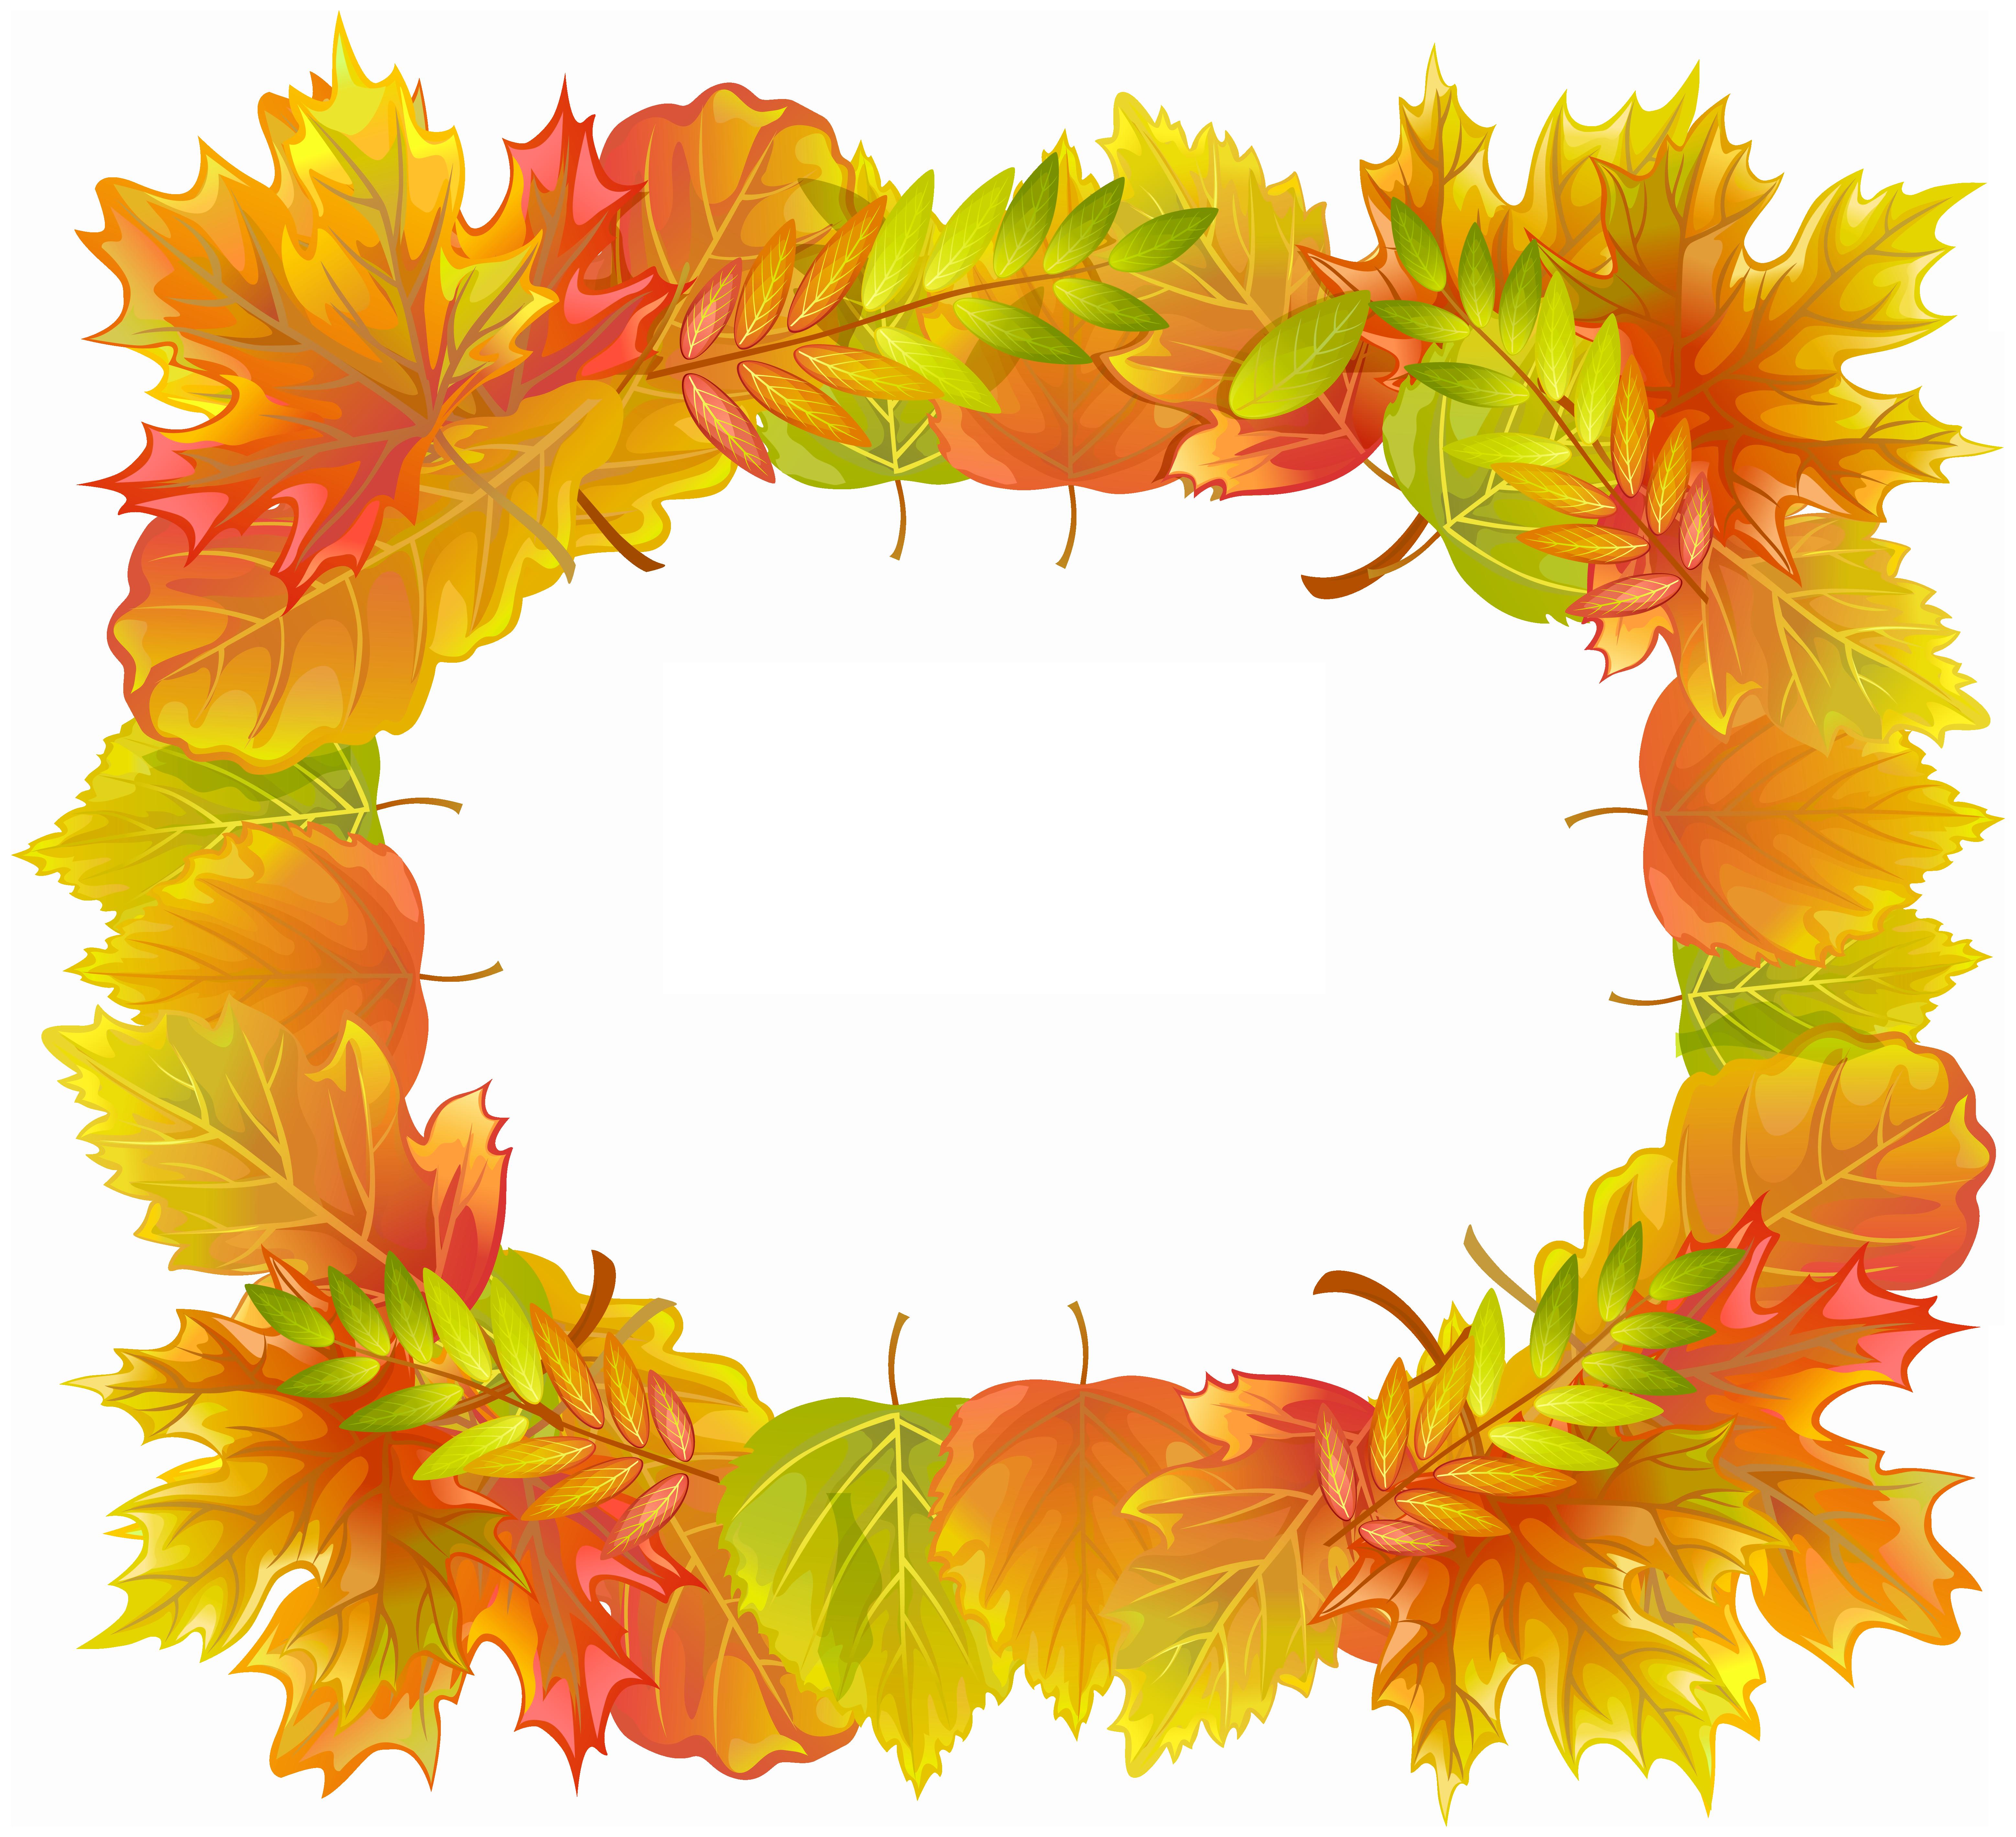 jpg transparent download Fall clipart borders. Autumn leafs border frame